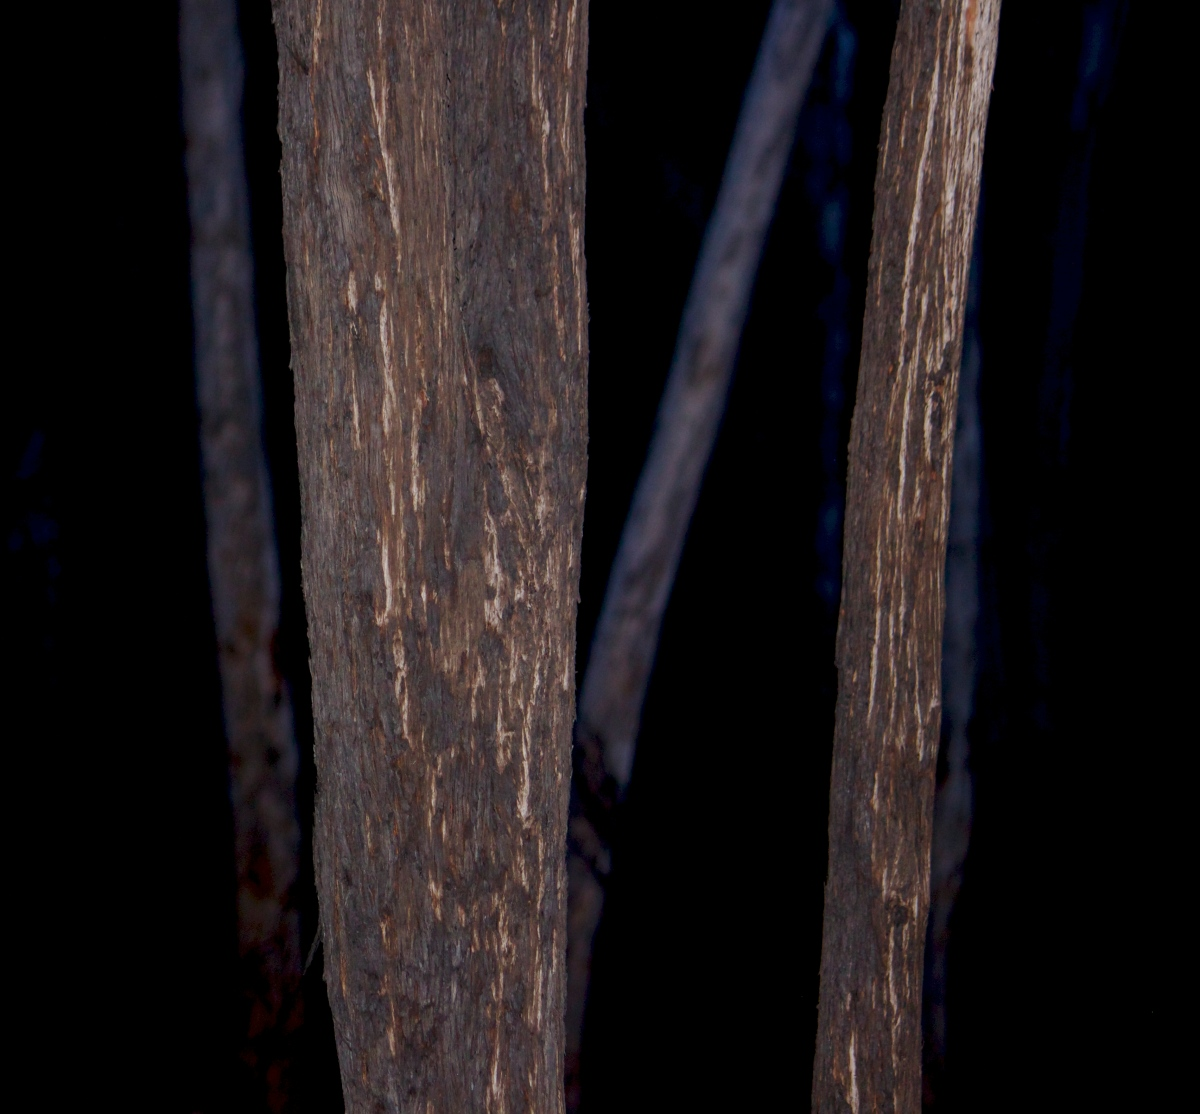 Eucalypt